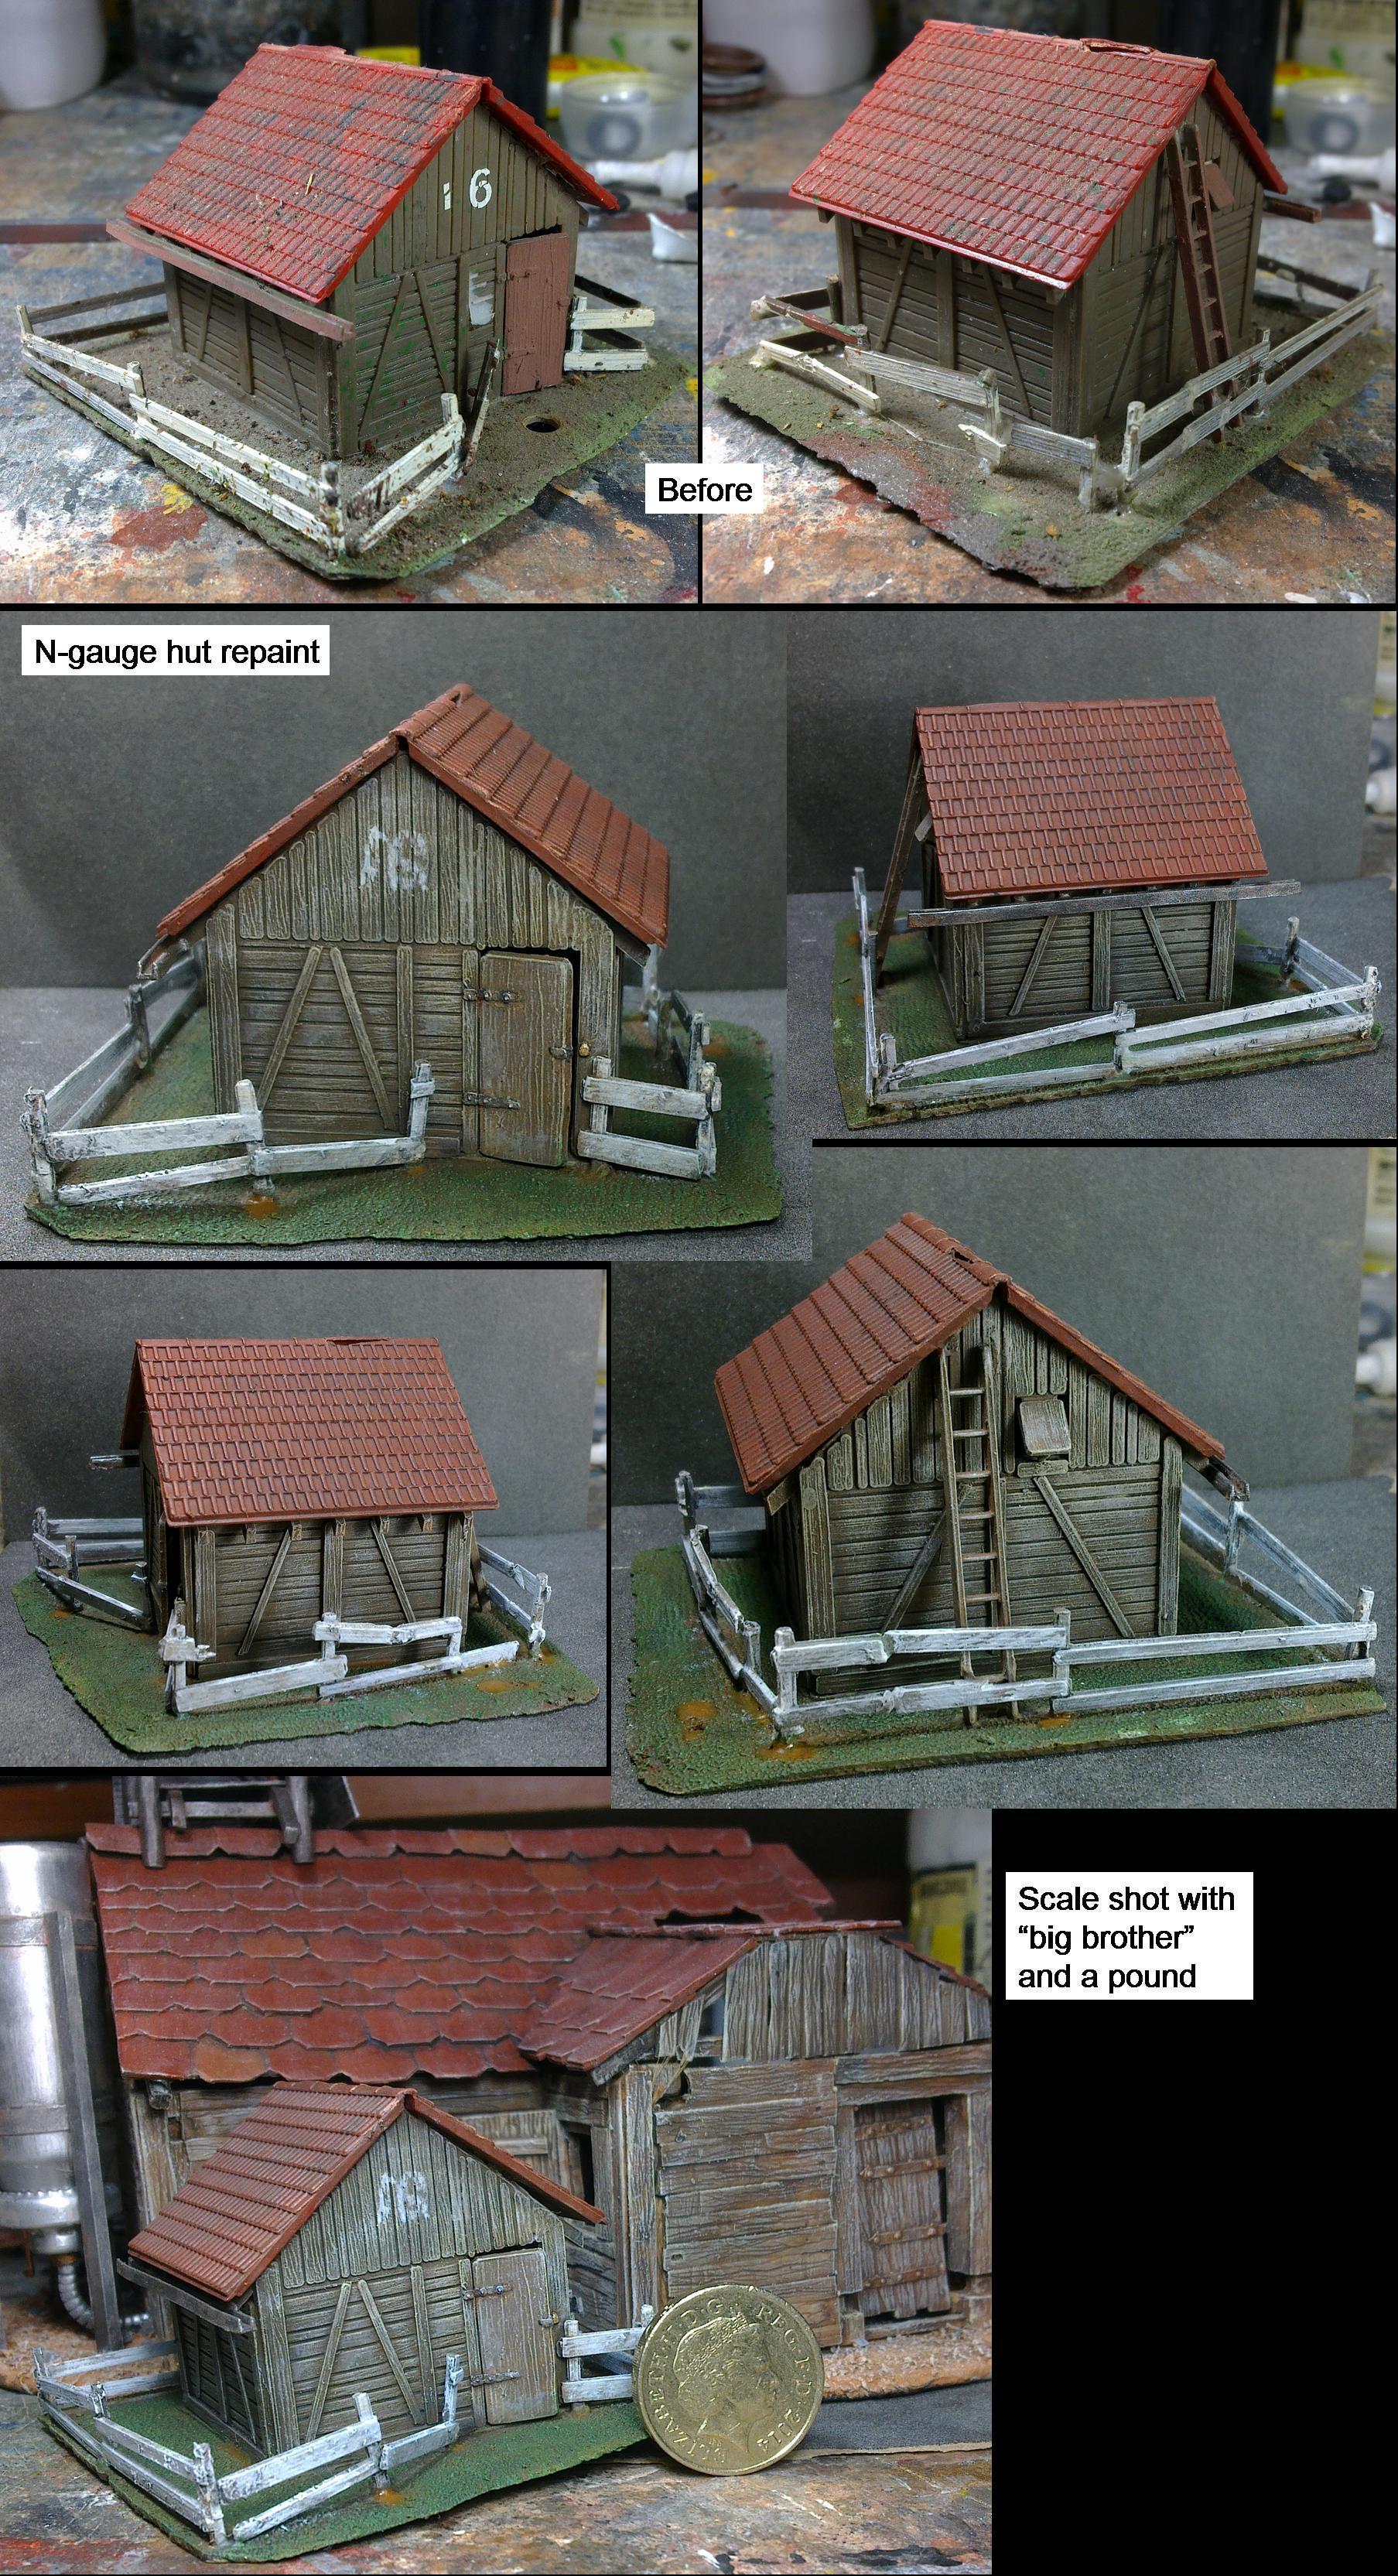 N-gauge hut re-paint